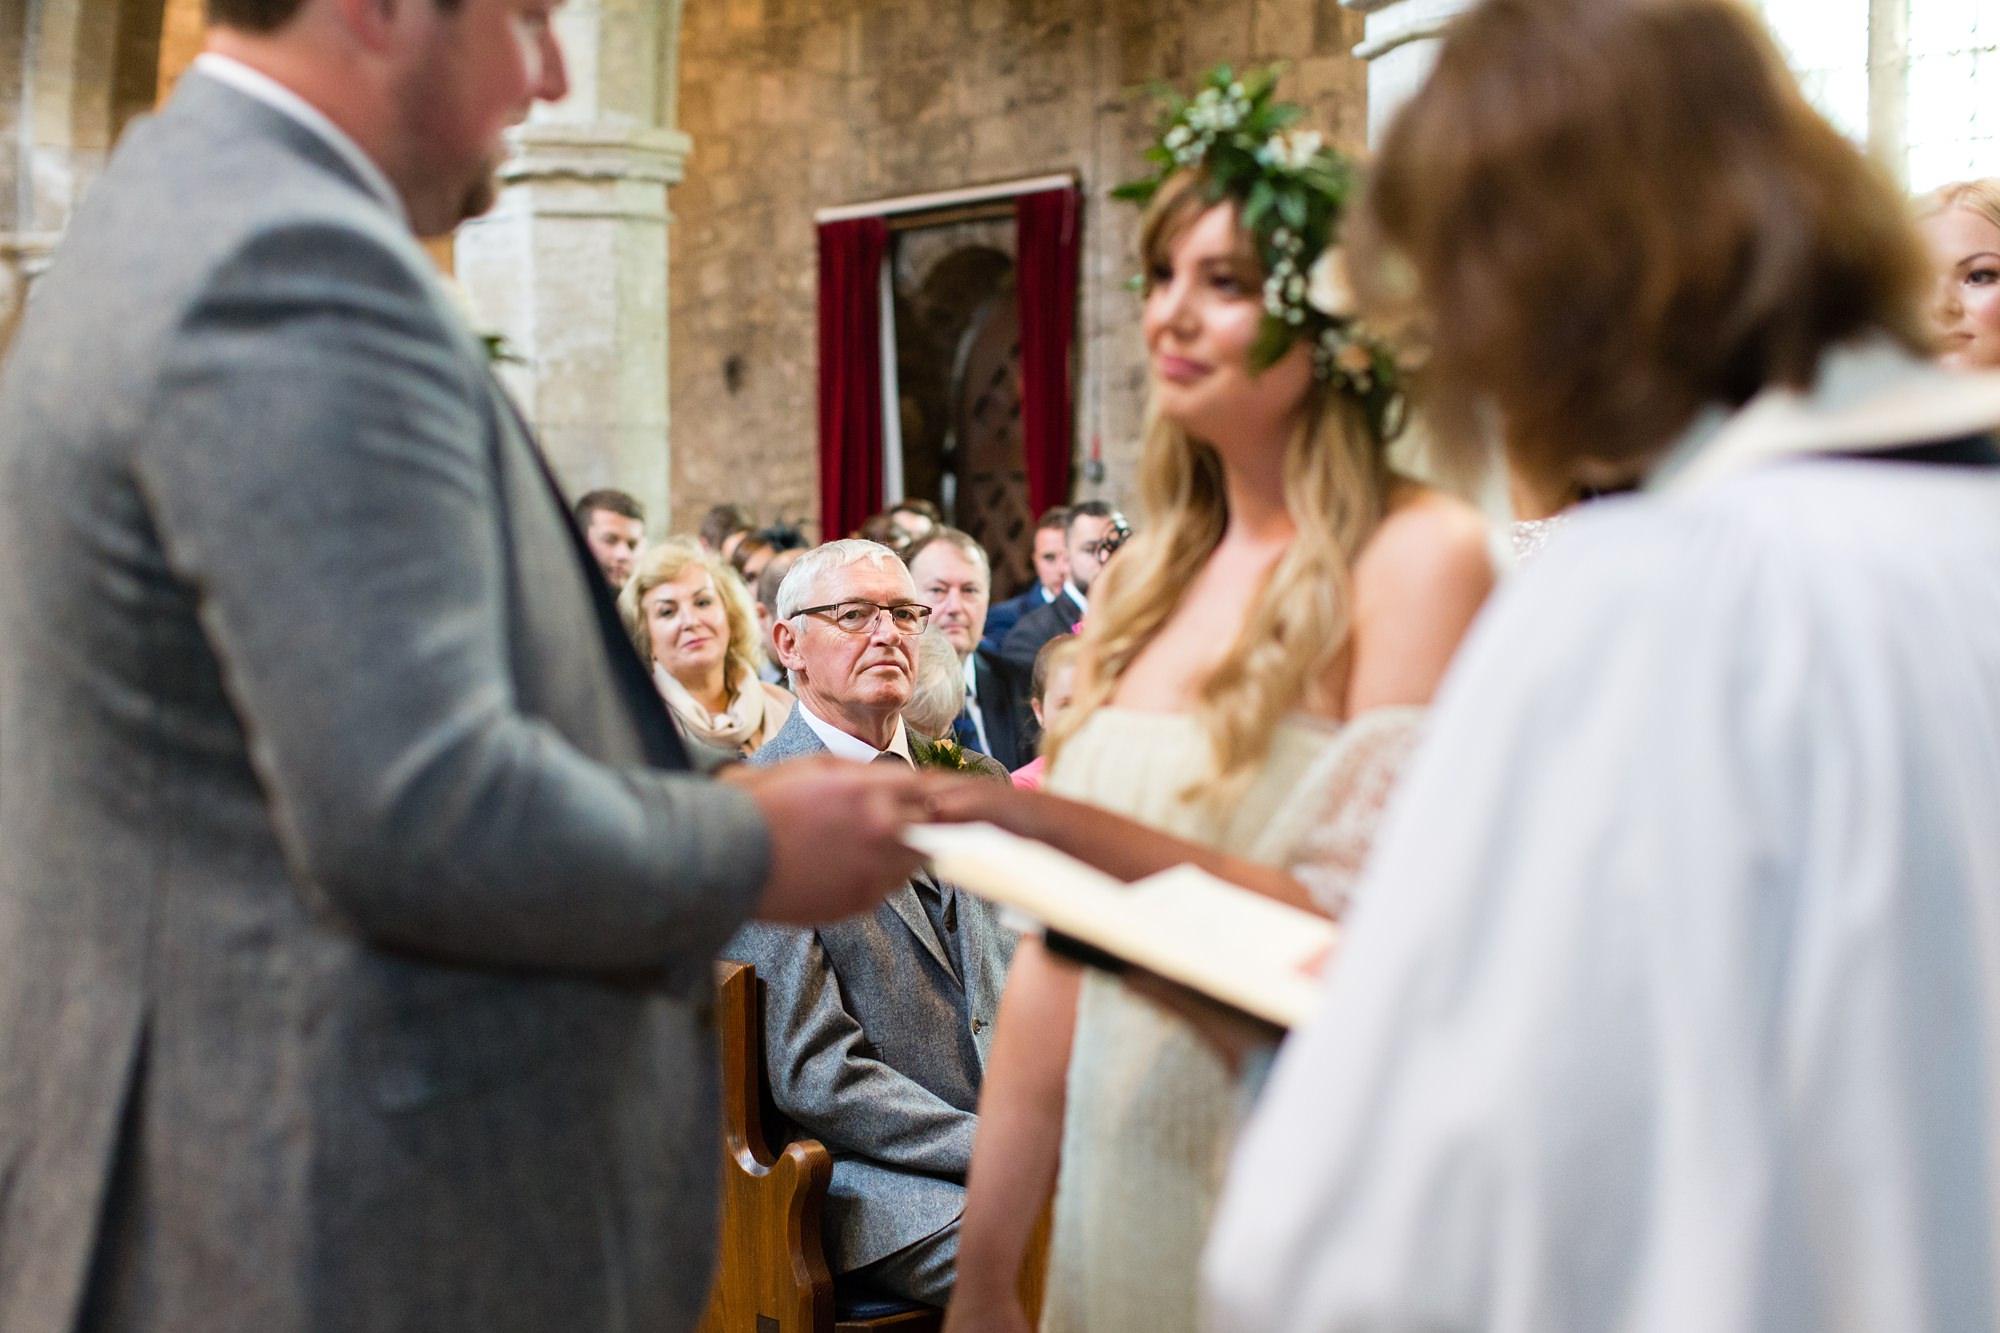 Villa farm wedding photography St. Wilfred's church in Brayton Ceremony